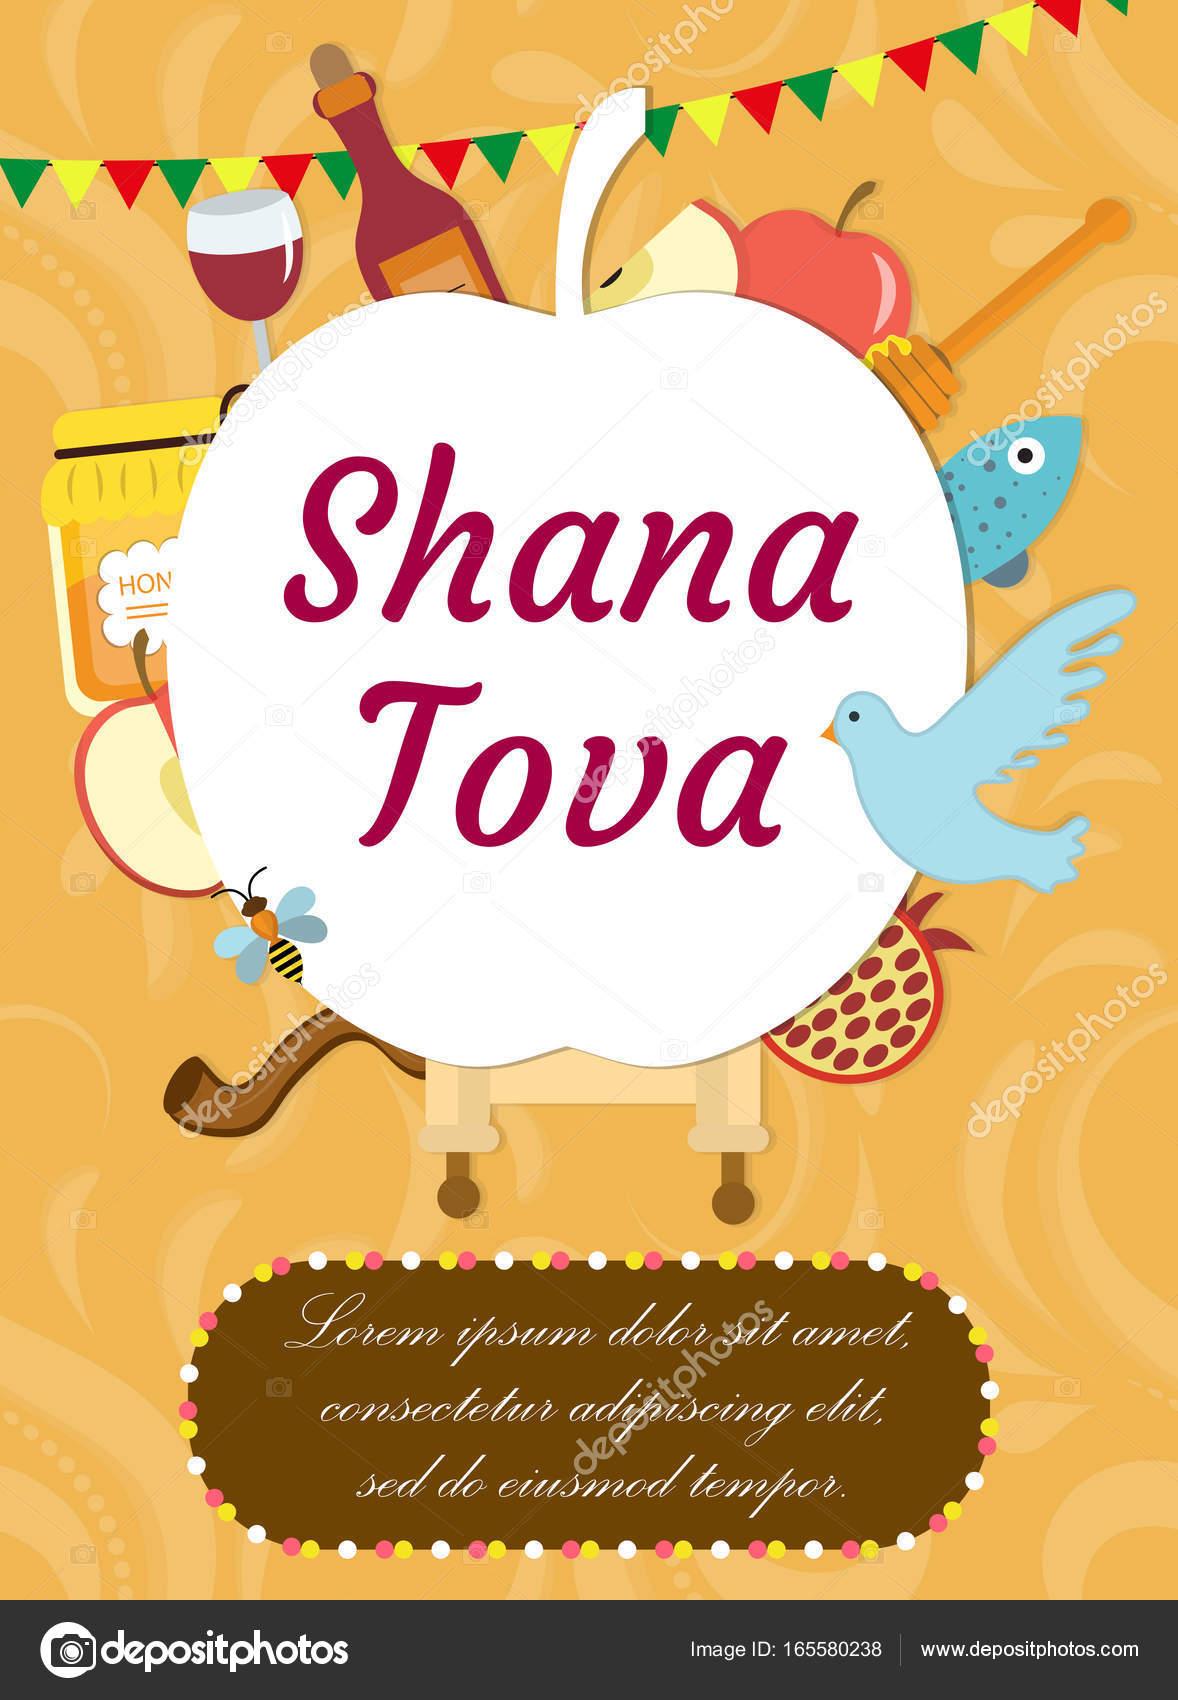 Rosh hashanah poster flyer invitation greeting card shana tova rosh hashanah poster flyer invitation greeting card shana tova is a template m4hsunfo